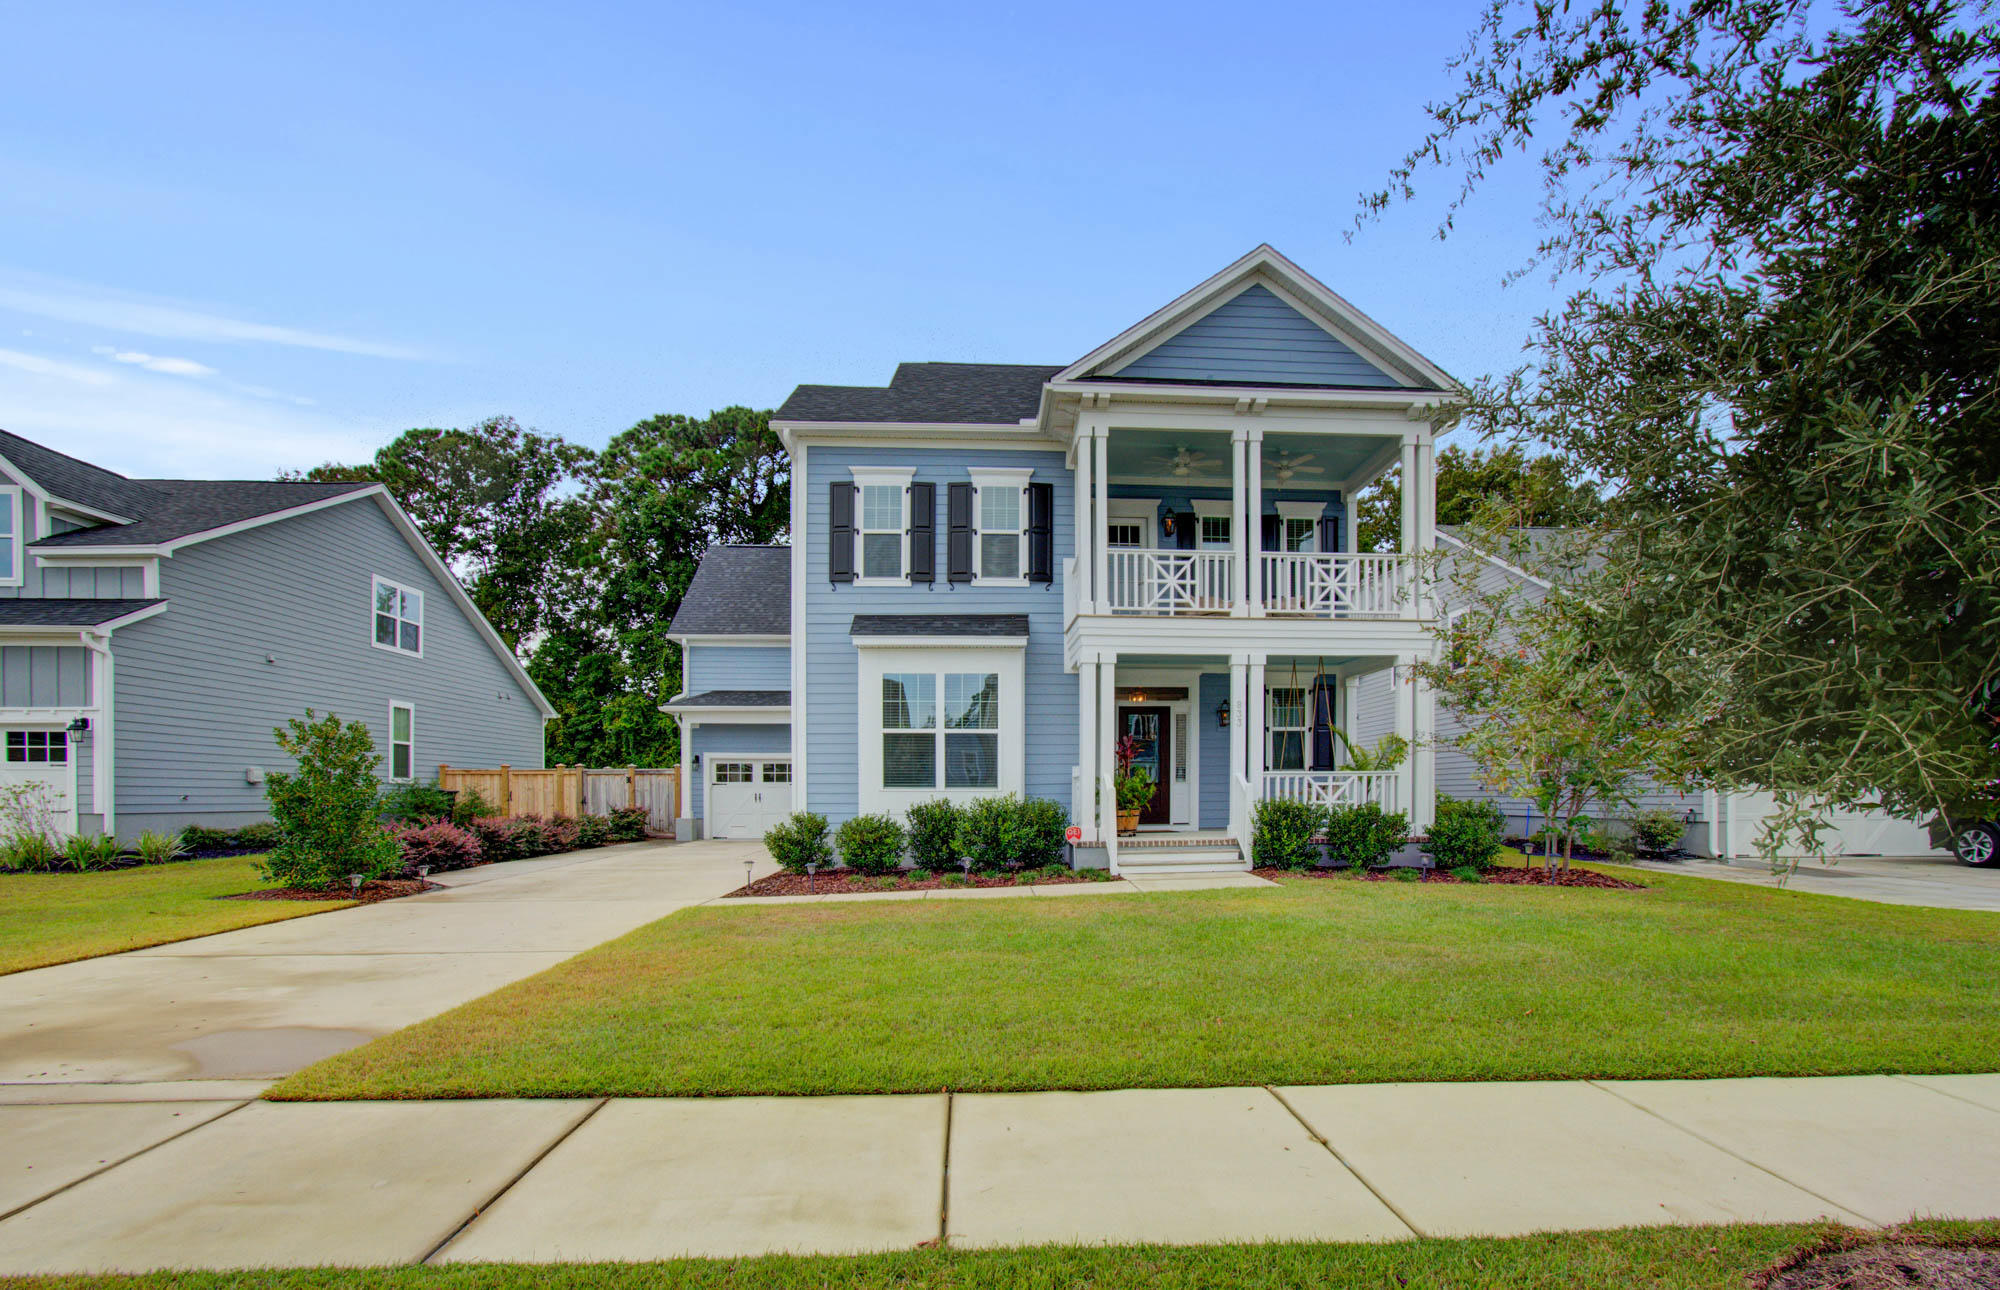 833 Shutes Folly Drive Charleston $725,000.00